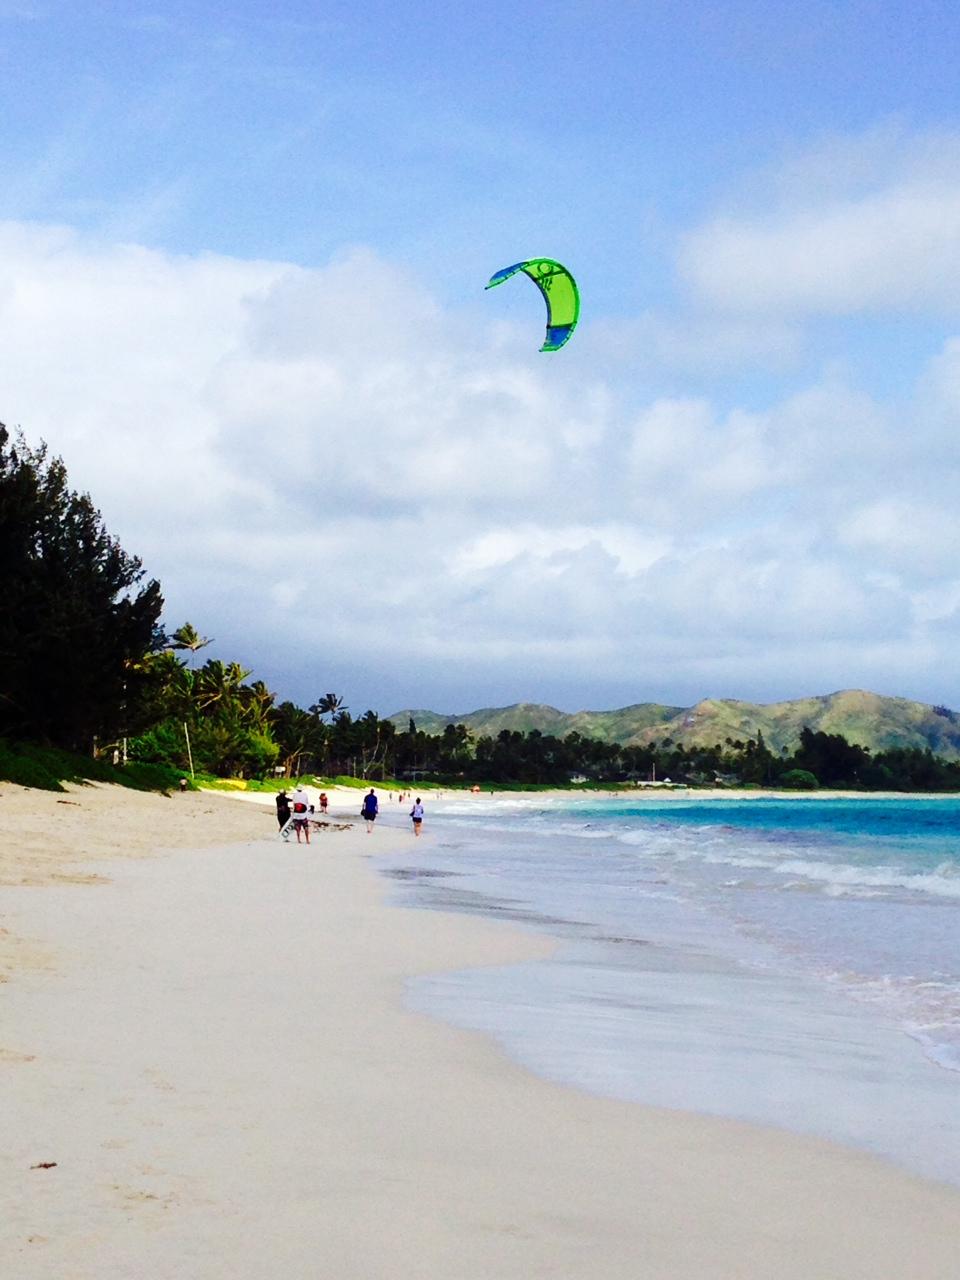 Windsurfing, Kailua Beach